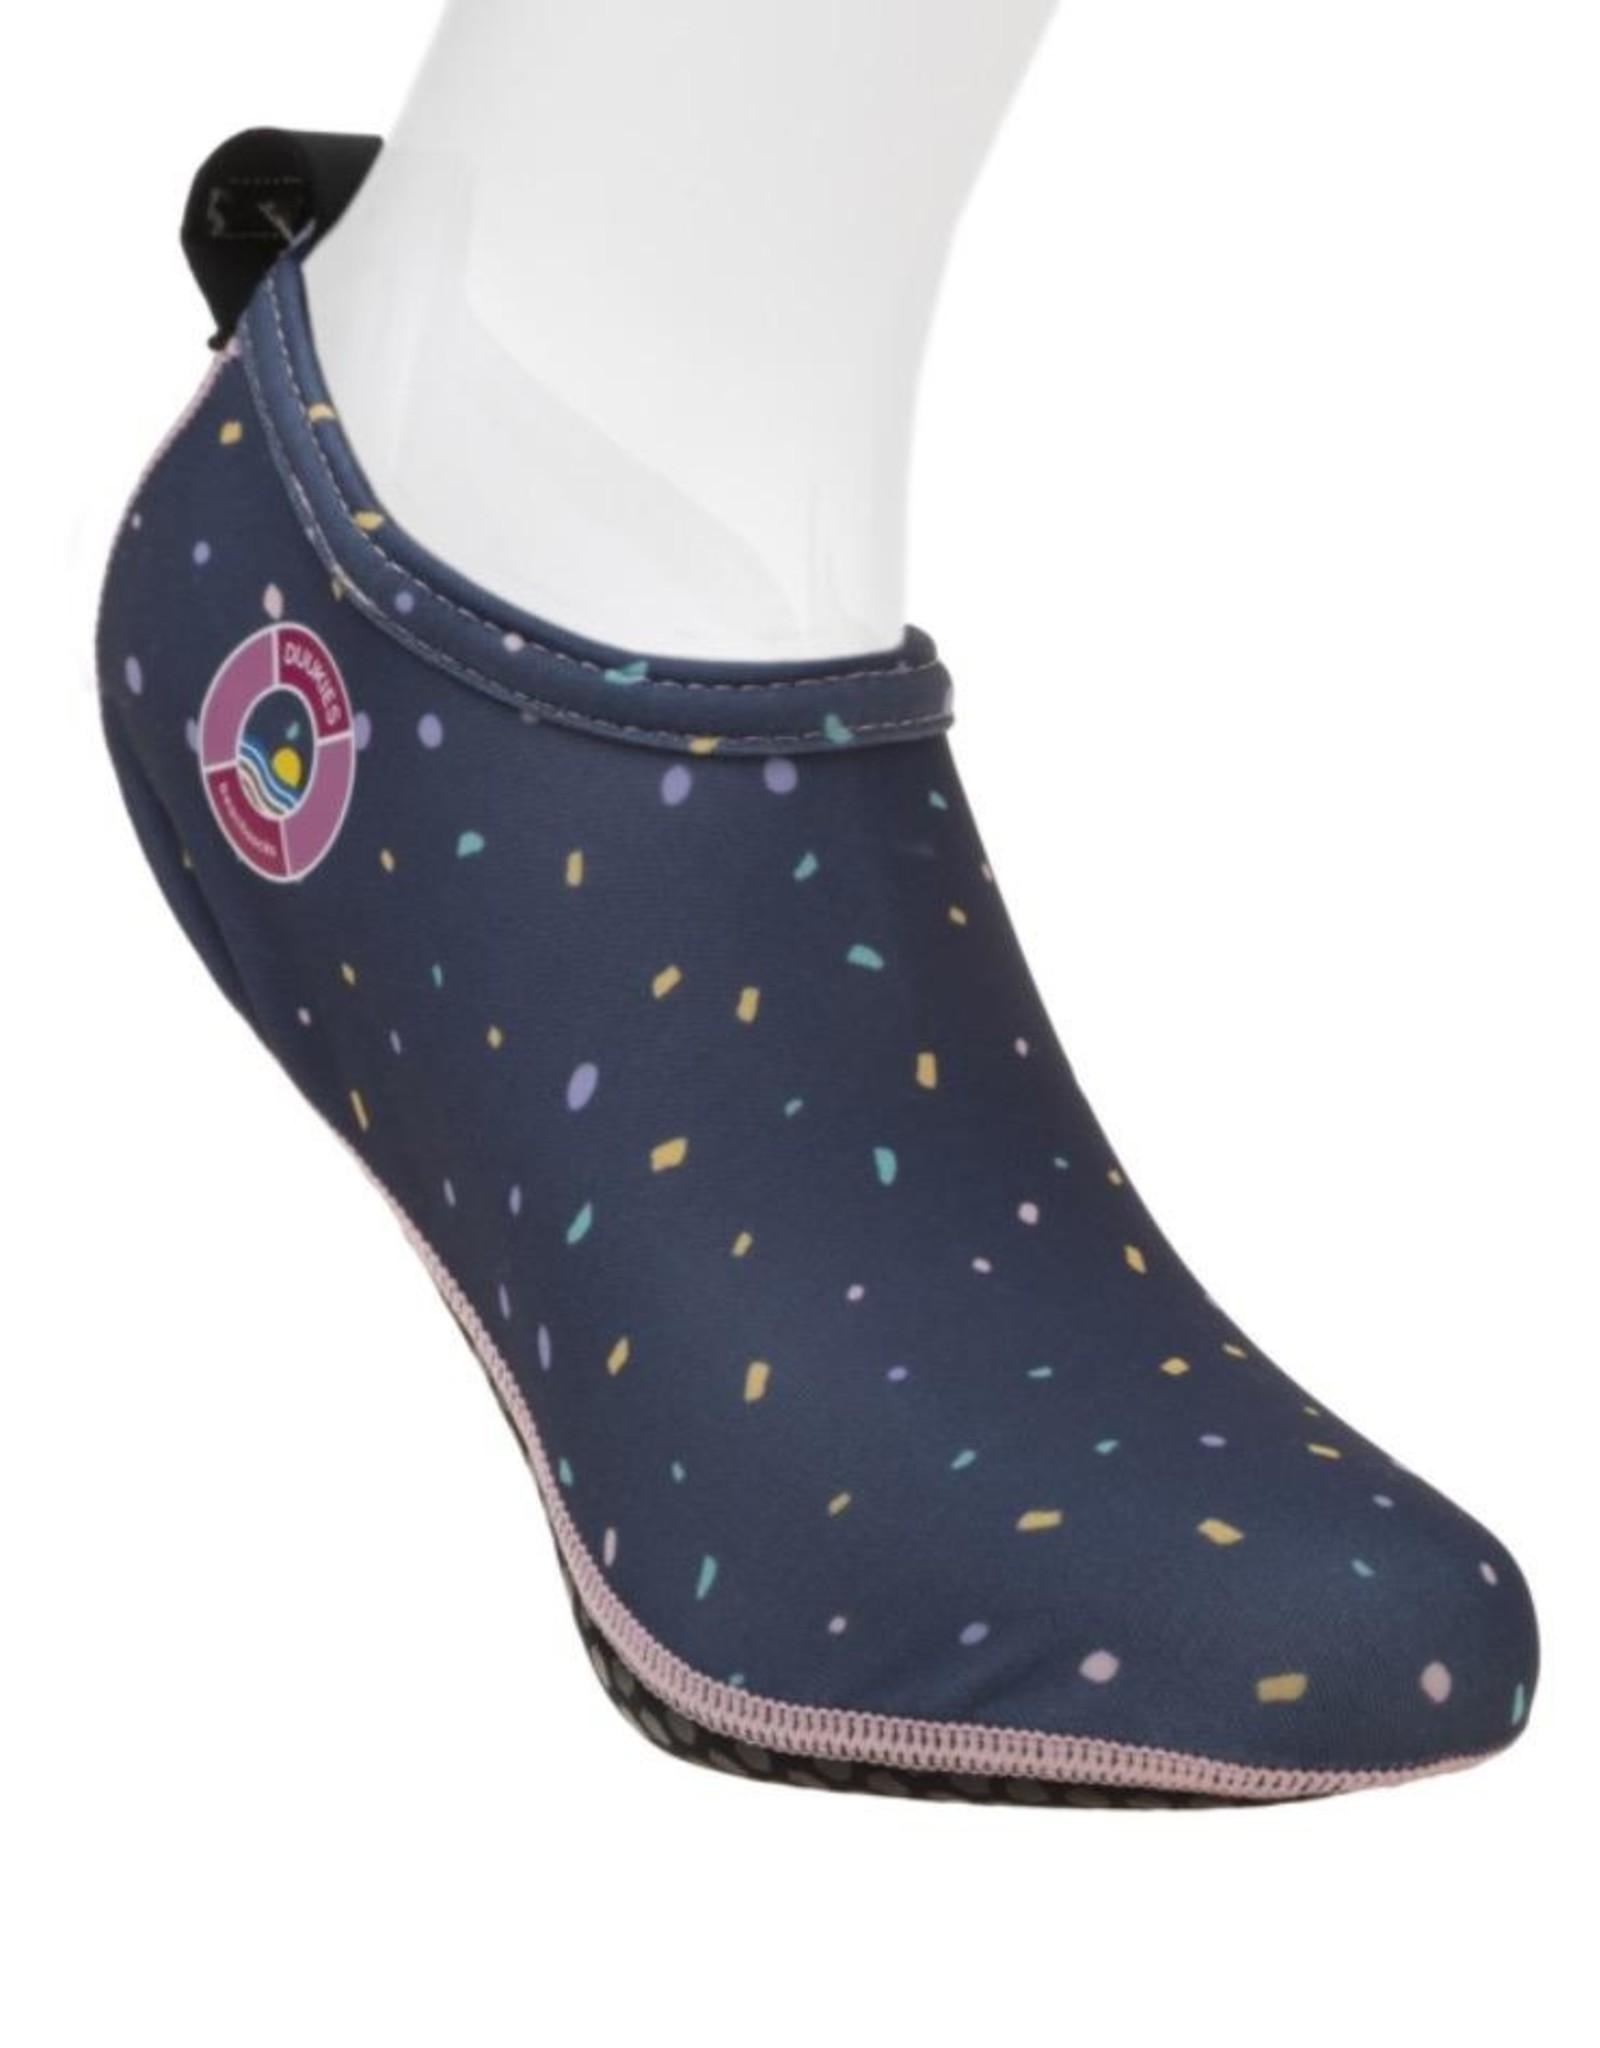 Duukies Beach Socks in Confetti Blue